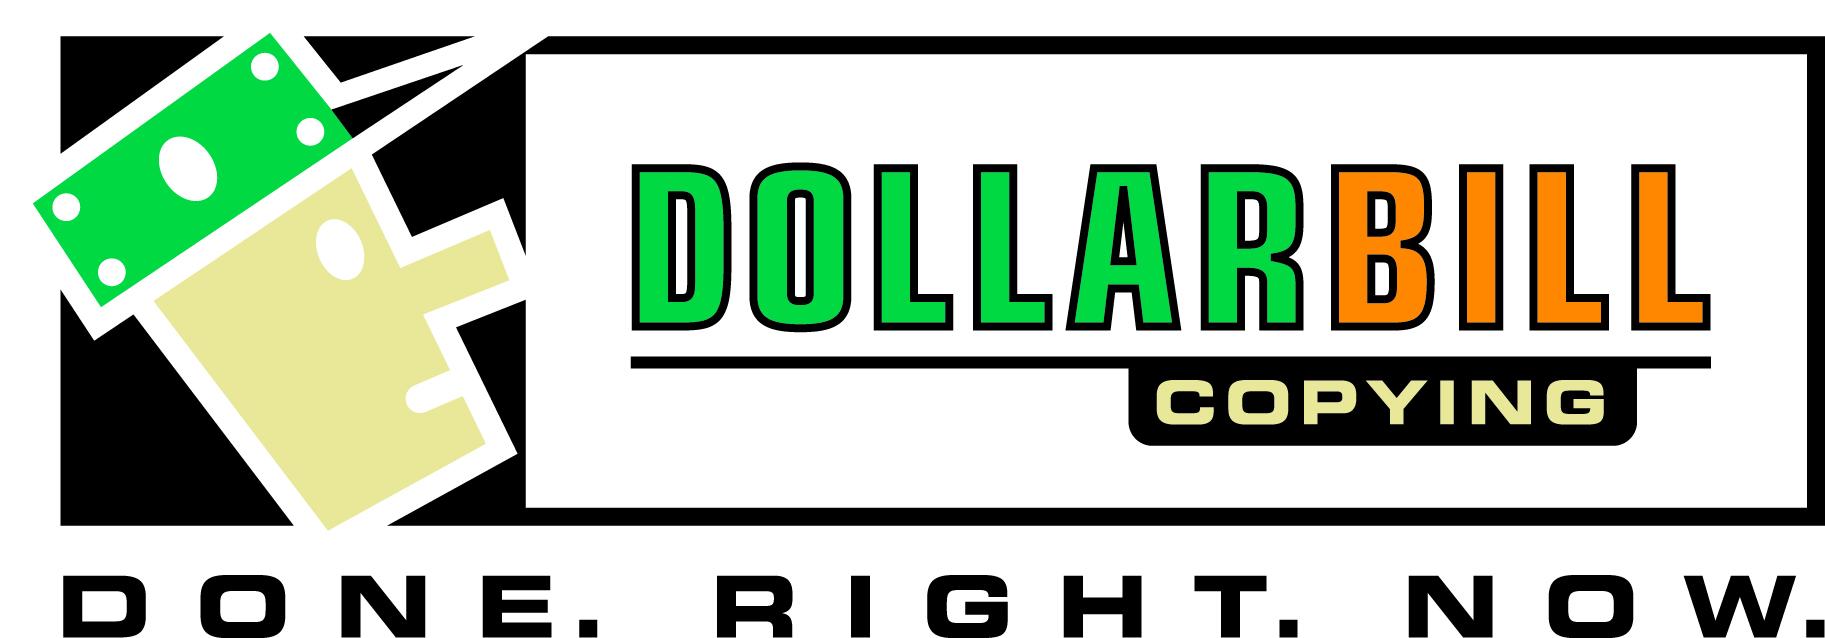 Dollarbill Copying